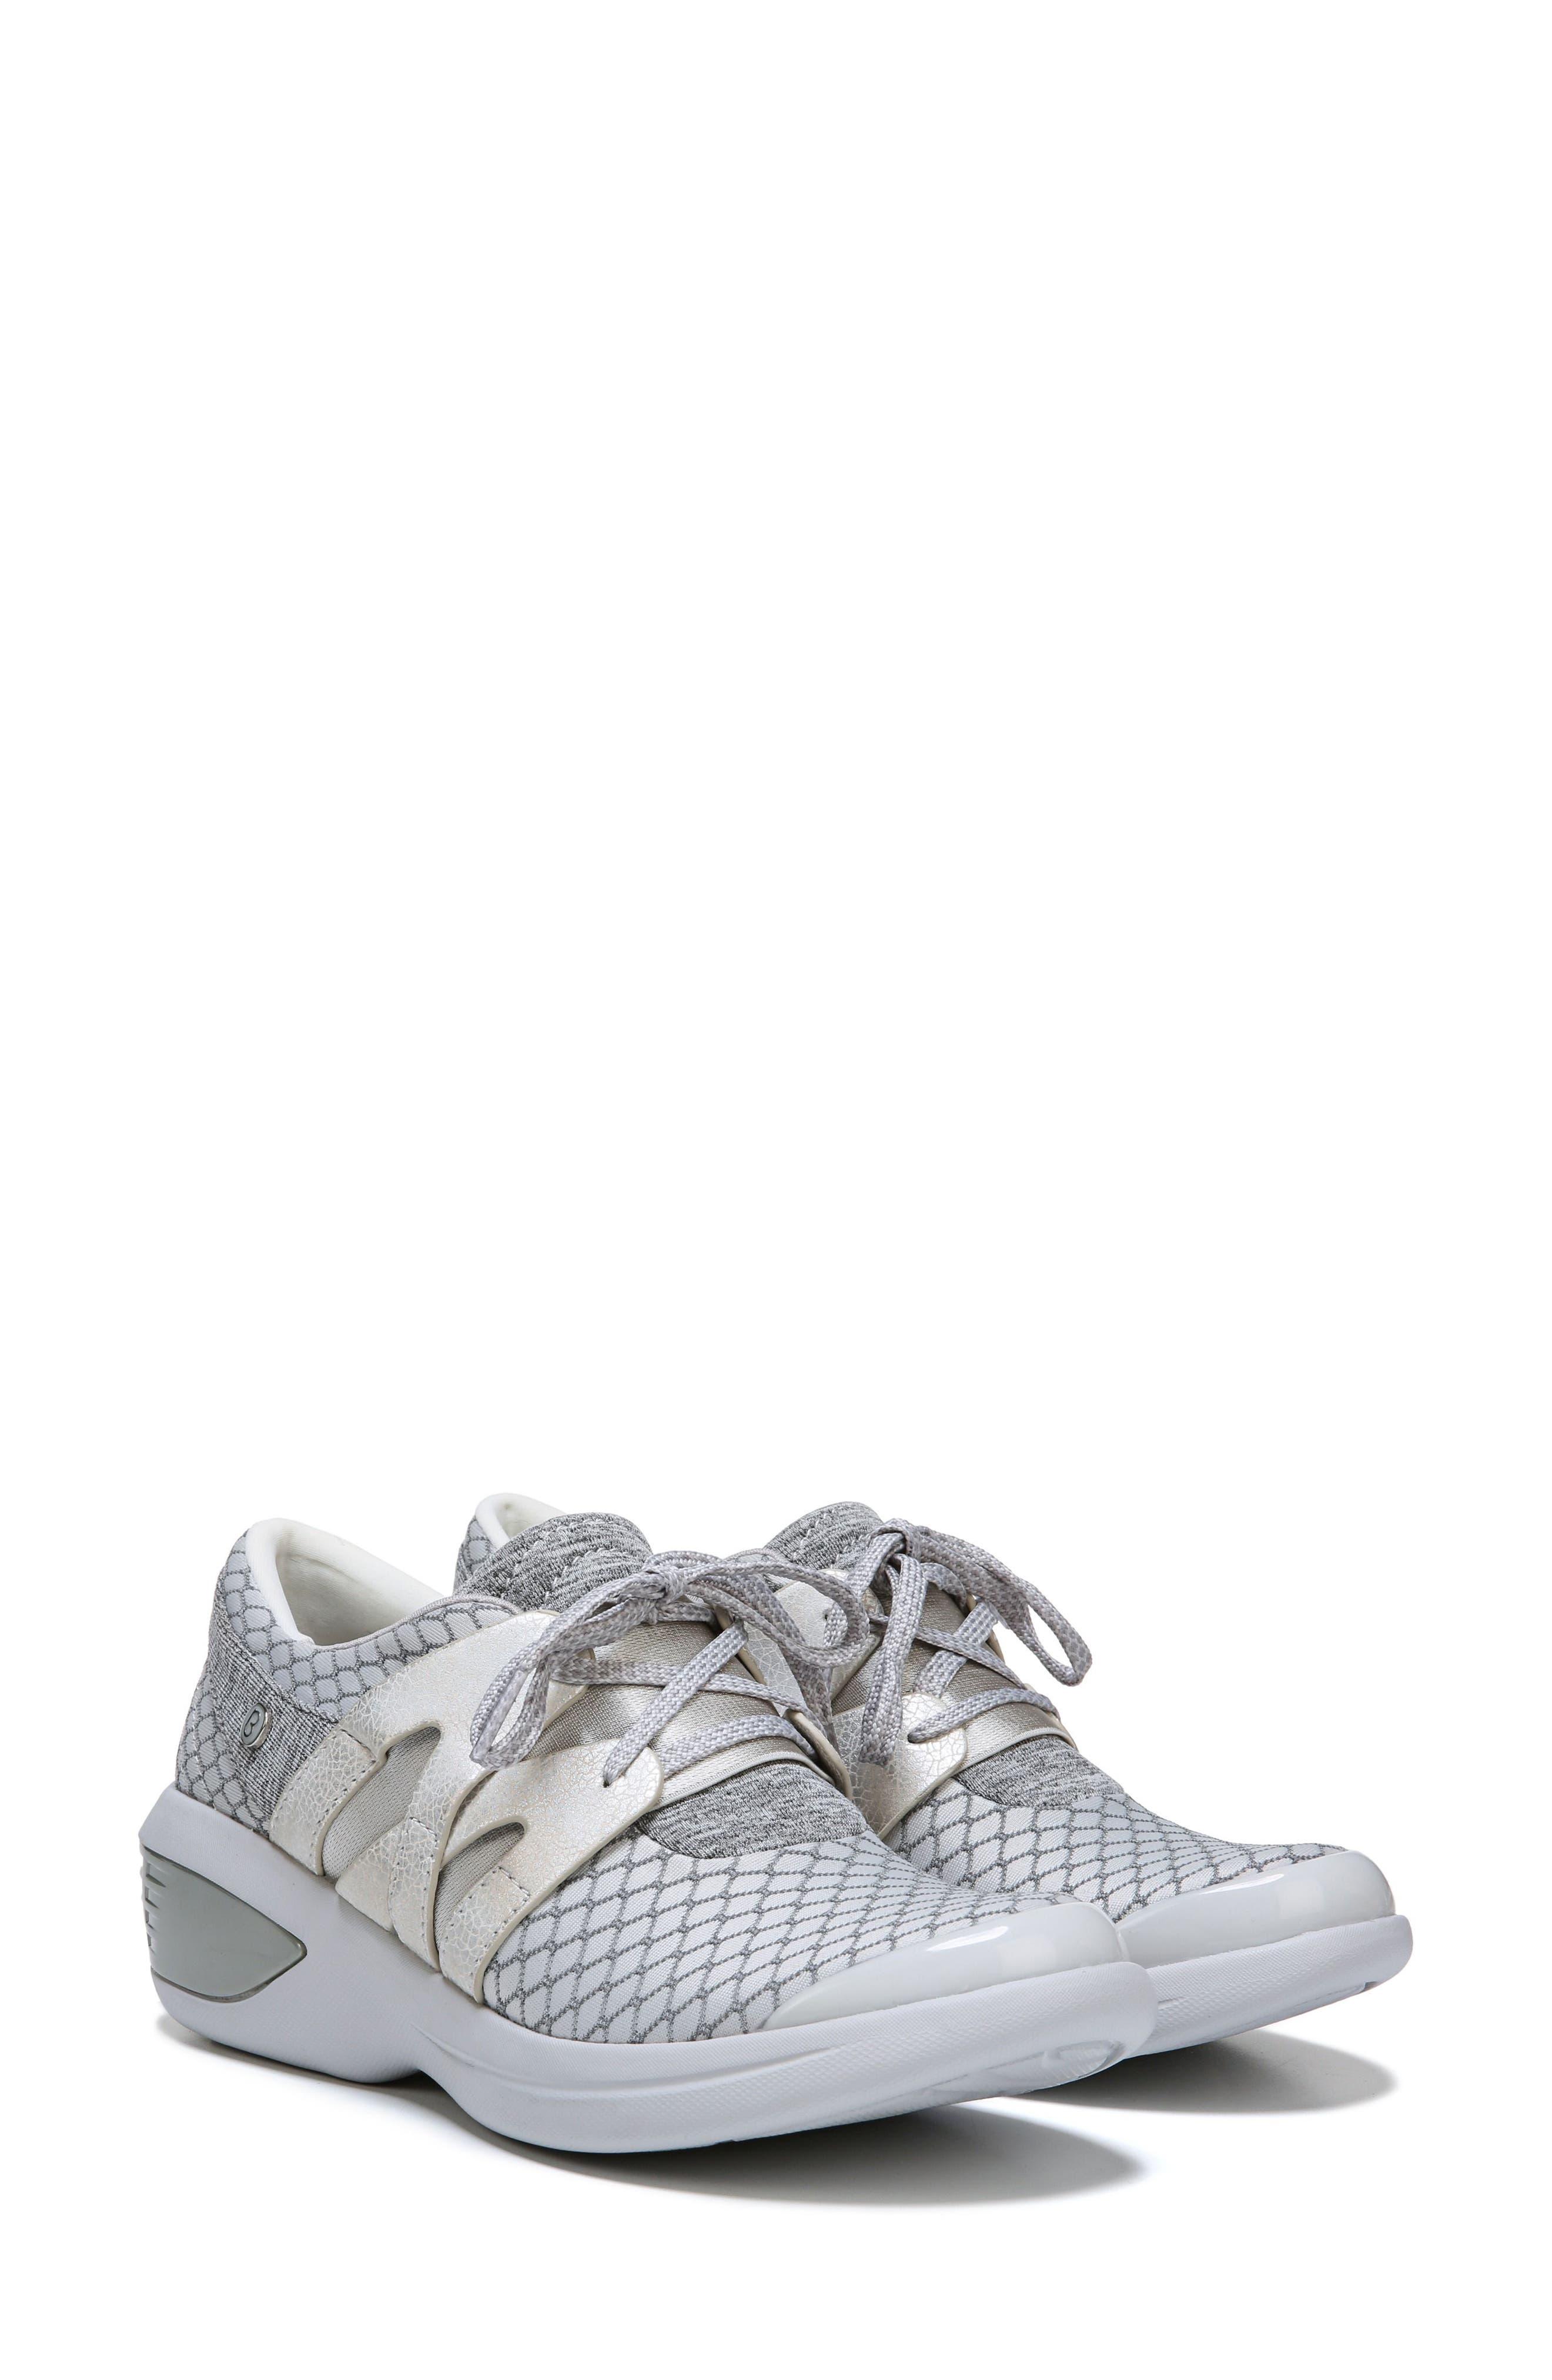 Flicker Sneaker,                             Alternate thumbnail 9, color,                             Grey Fabric